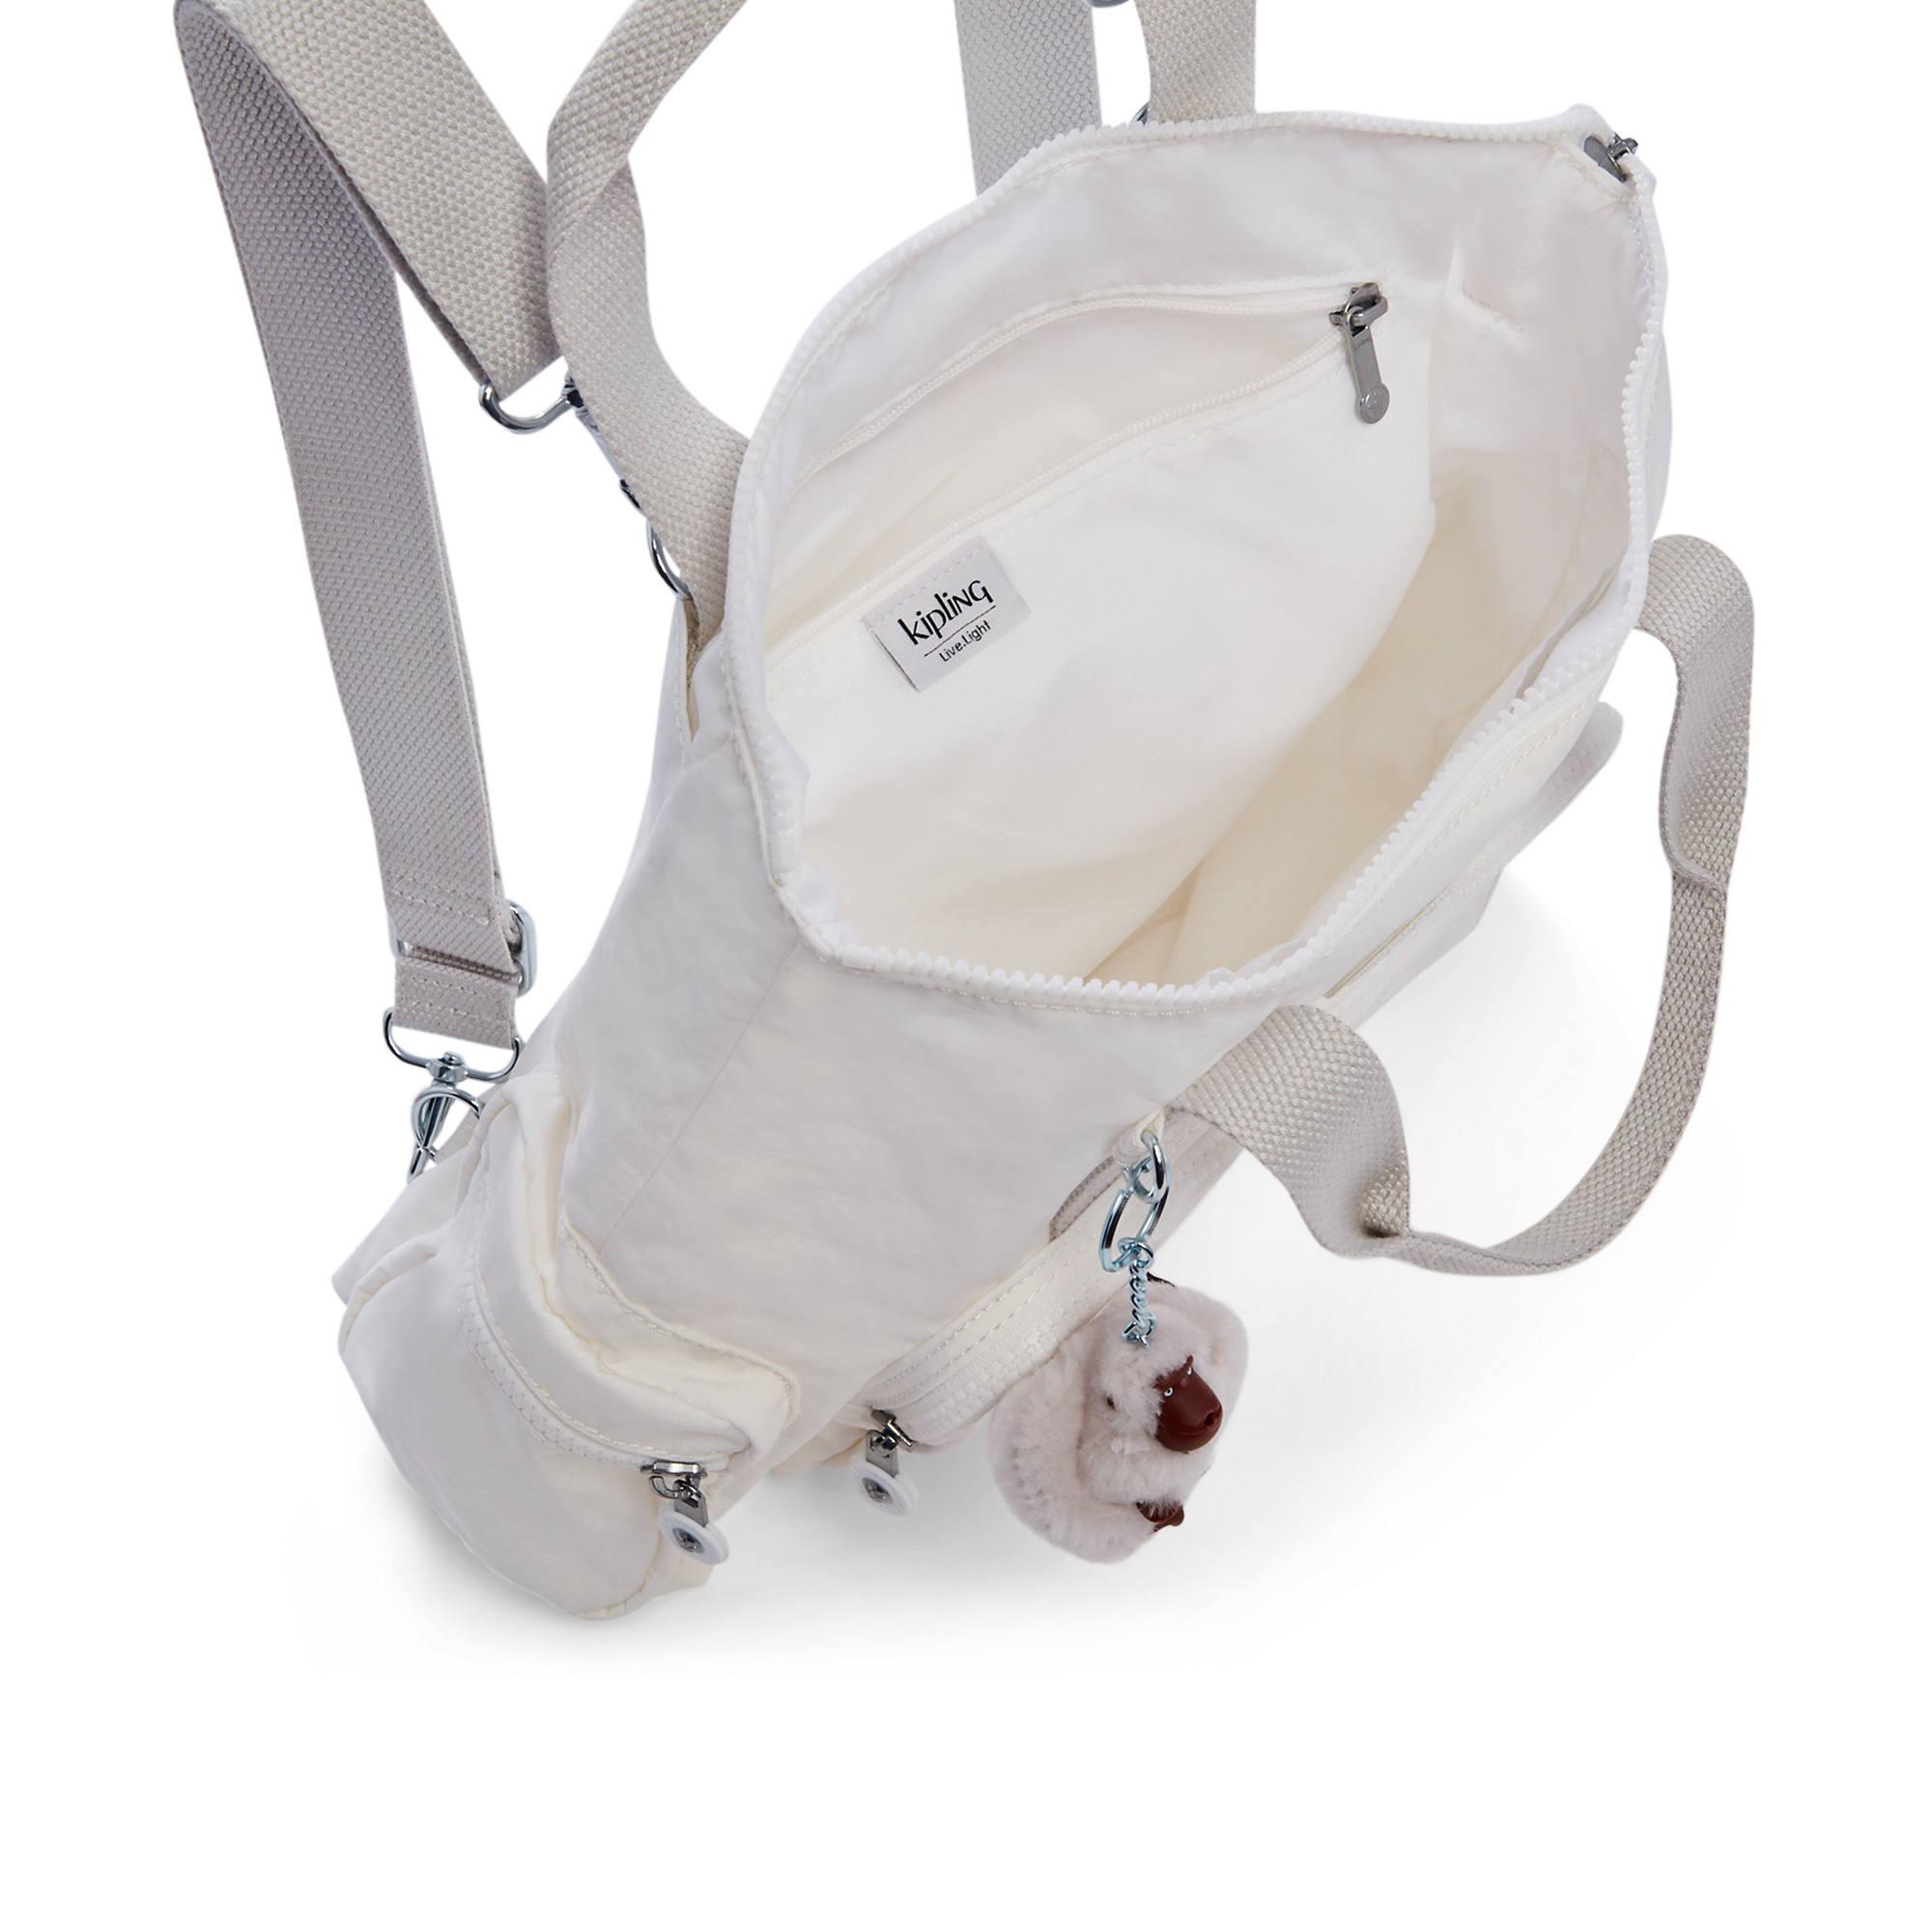 Kipling-Alvy-2-In-1-Convertible-Tote-Bag-Backpack miniatura 6